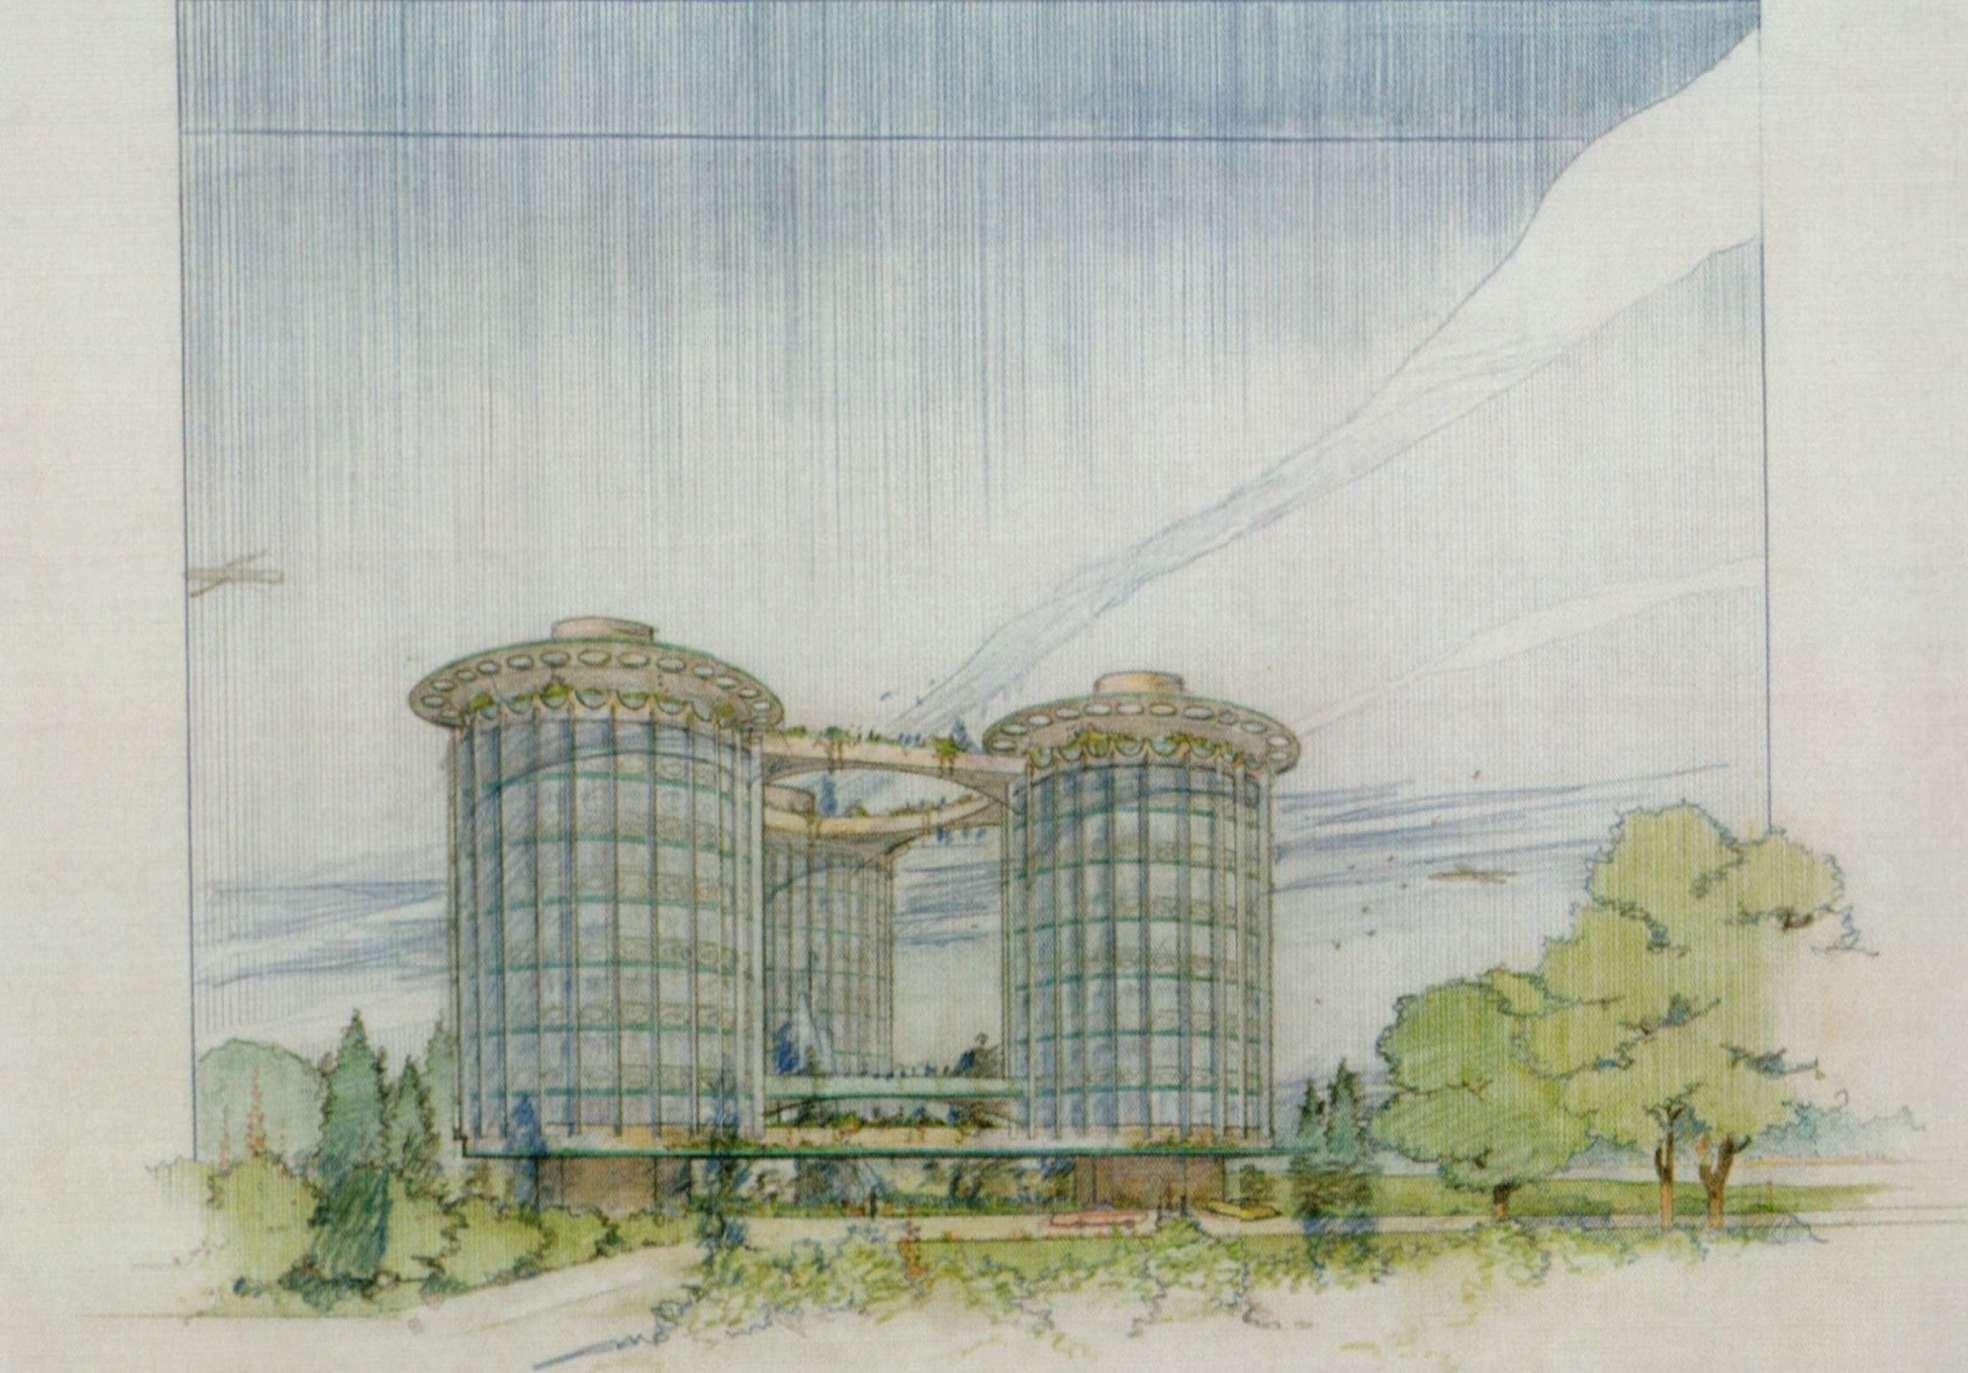 tn-memphis-bramlett-motor-hotel-by-fllw-1-1956